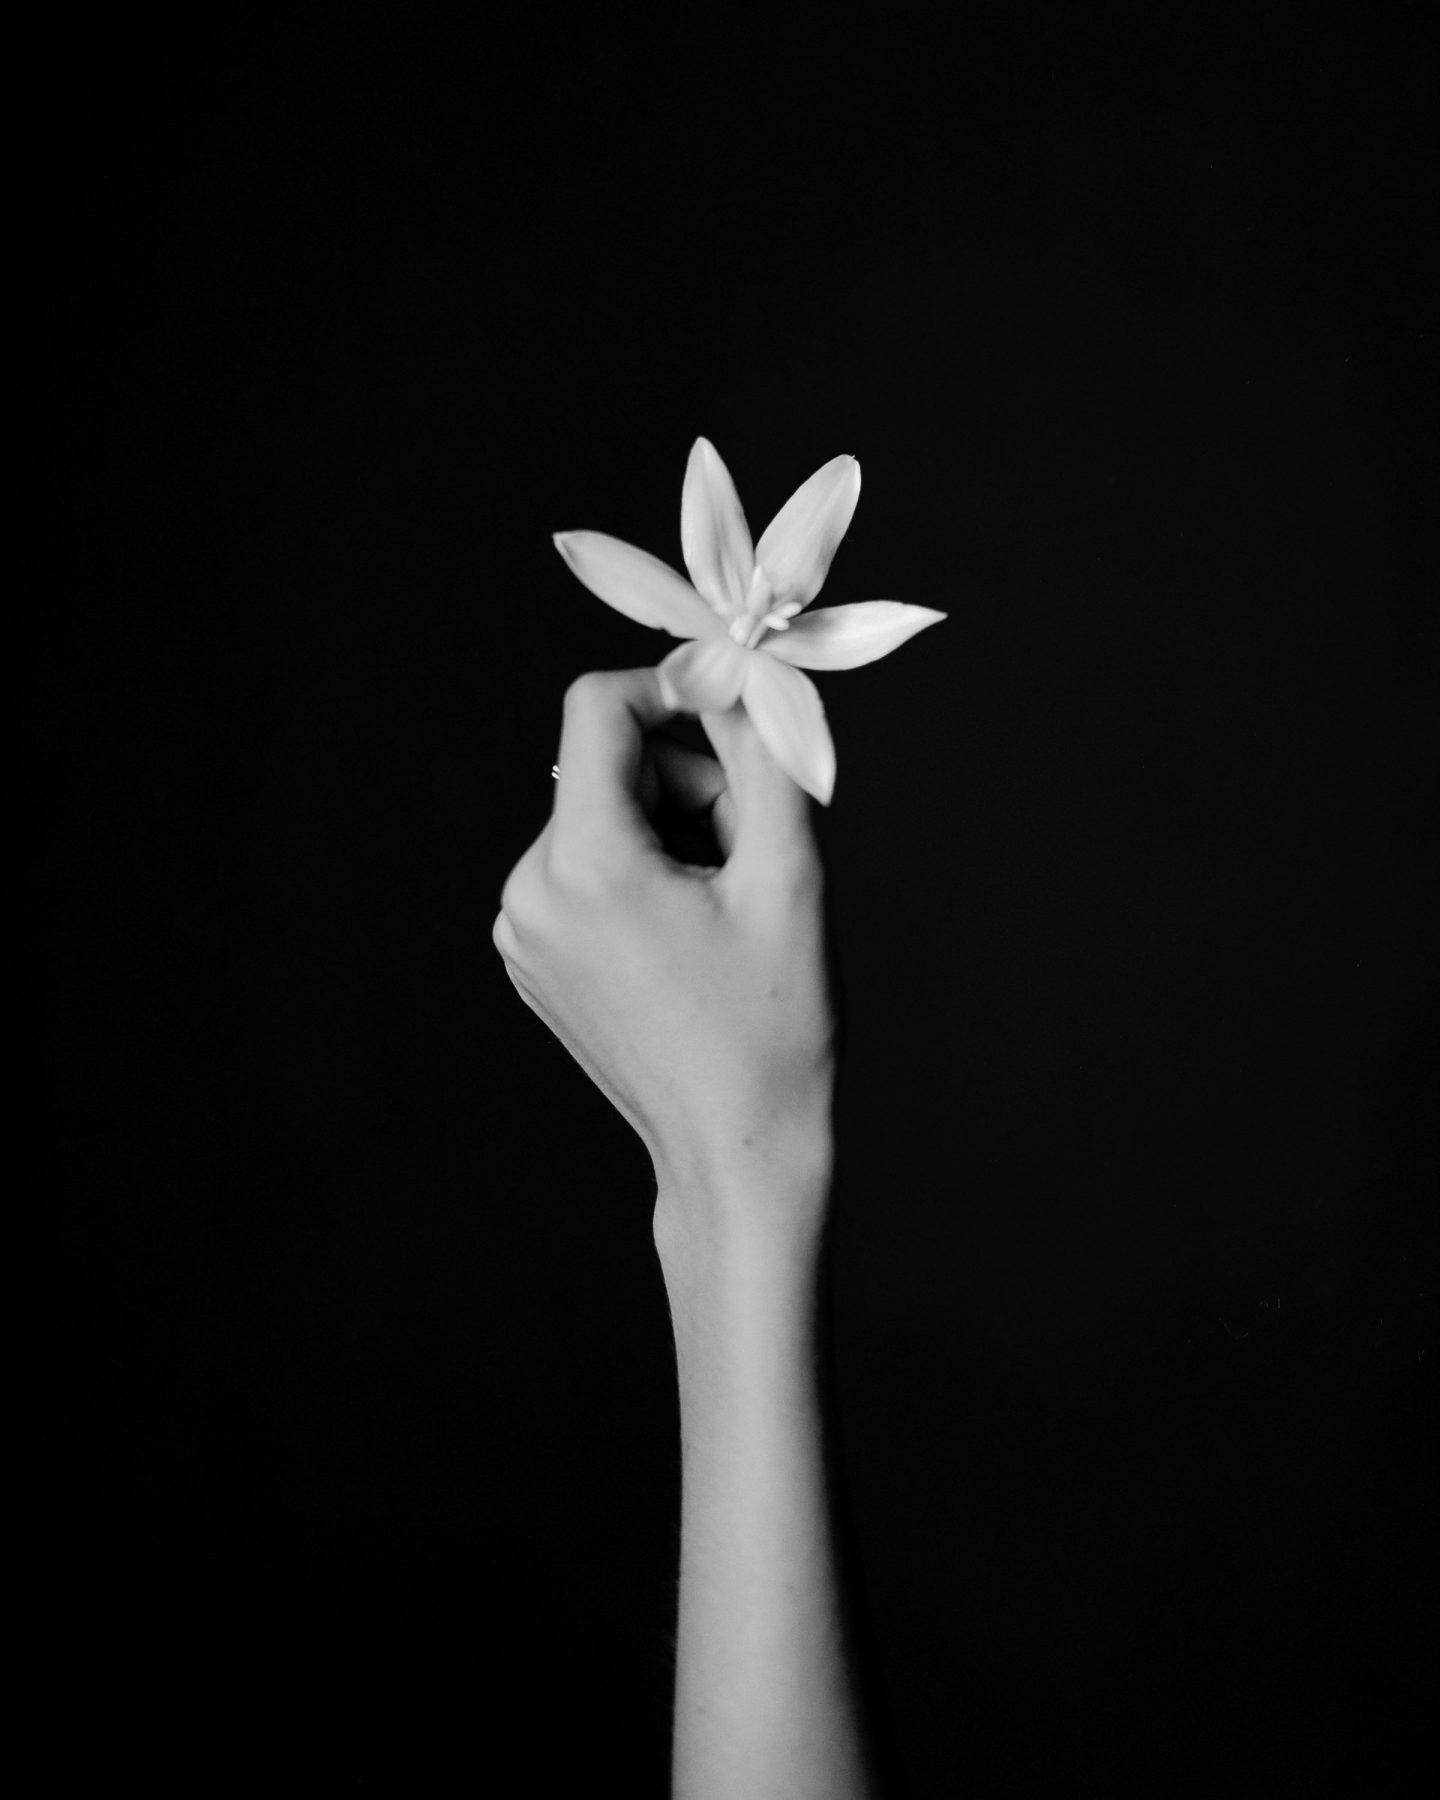 IGNANT-Photography-Riccardo-Svelto-Ramingo-014-min